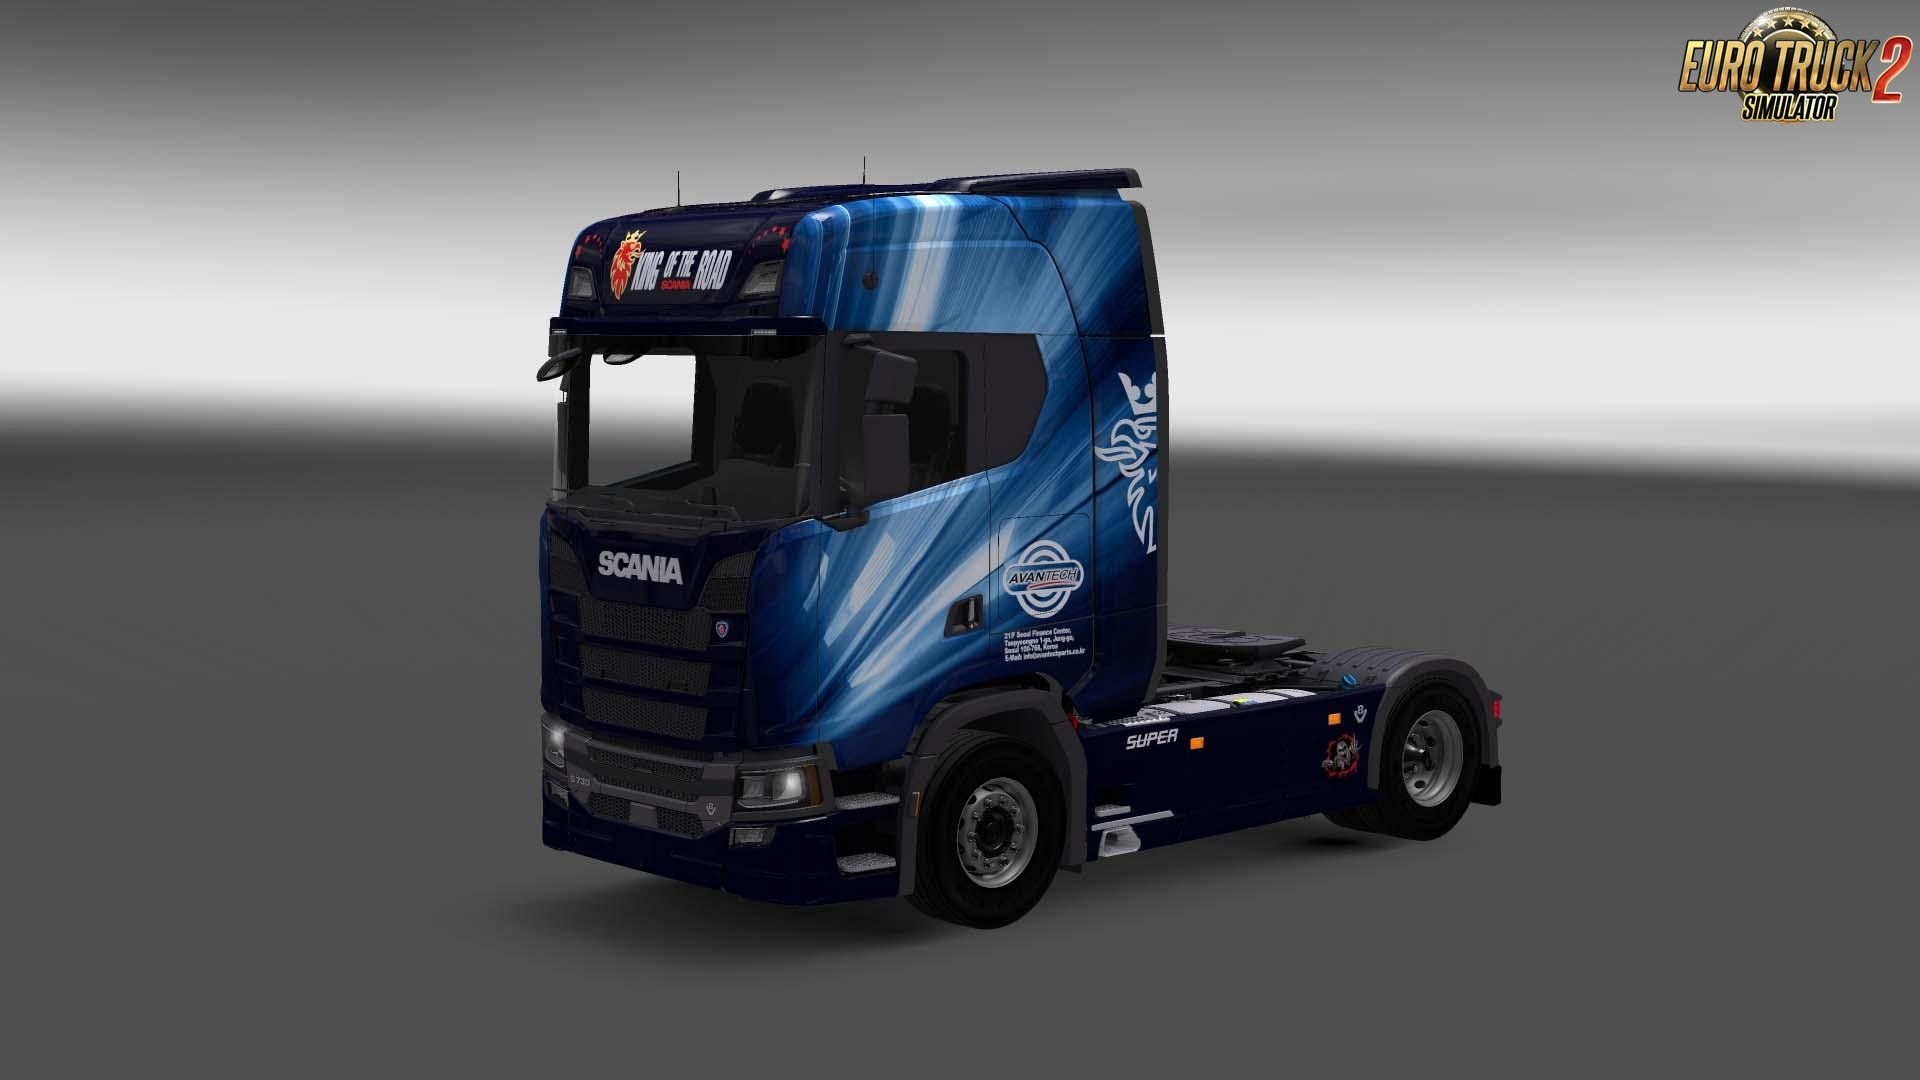 Avantech skin for Scania S730 v1 0 (1 27 x) » ETS2 mods, SCS